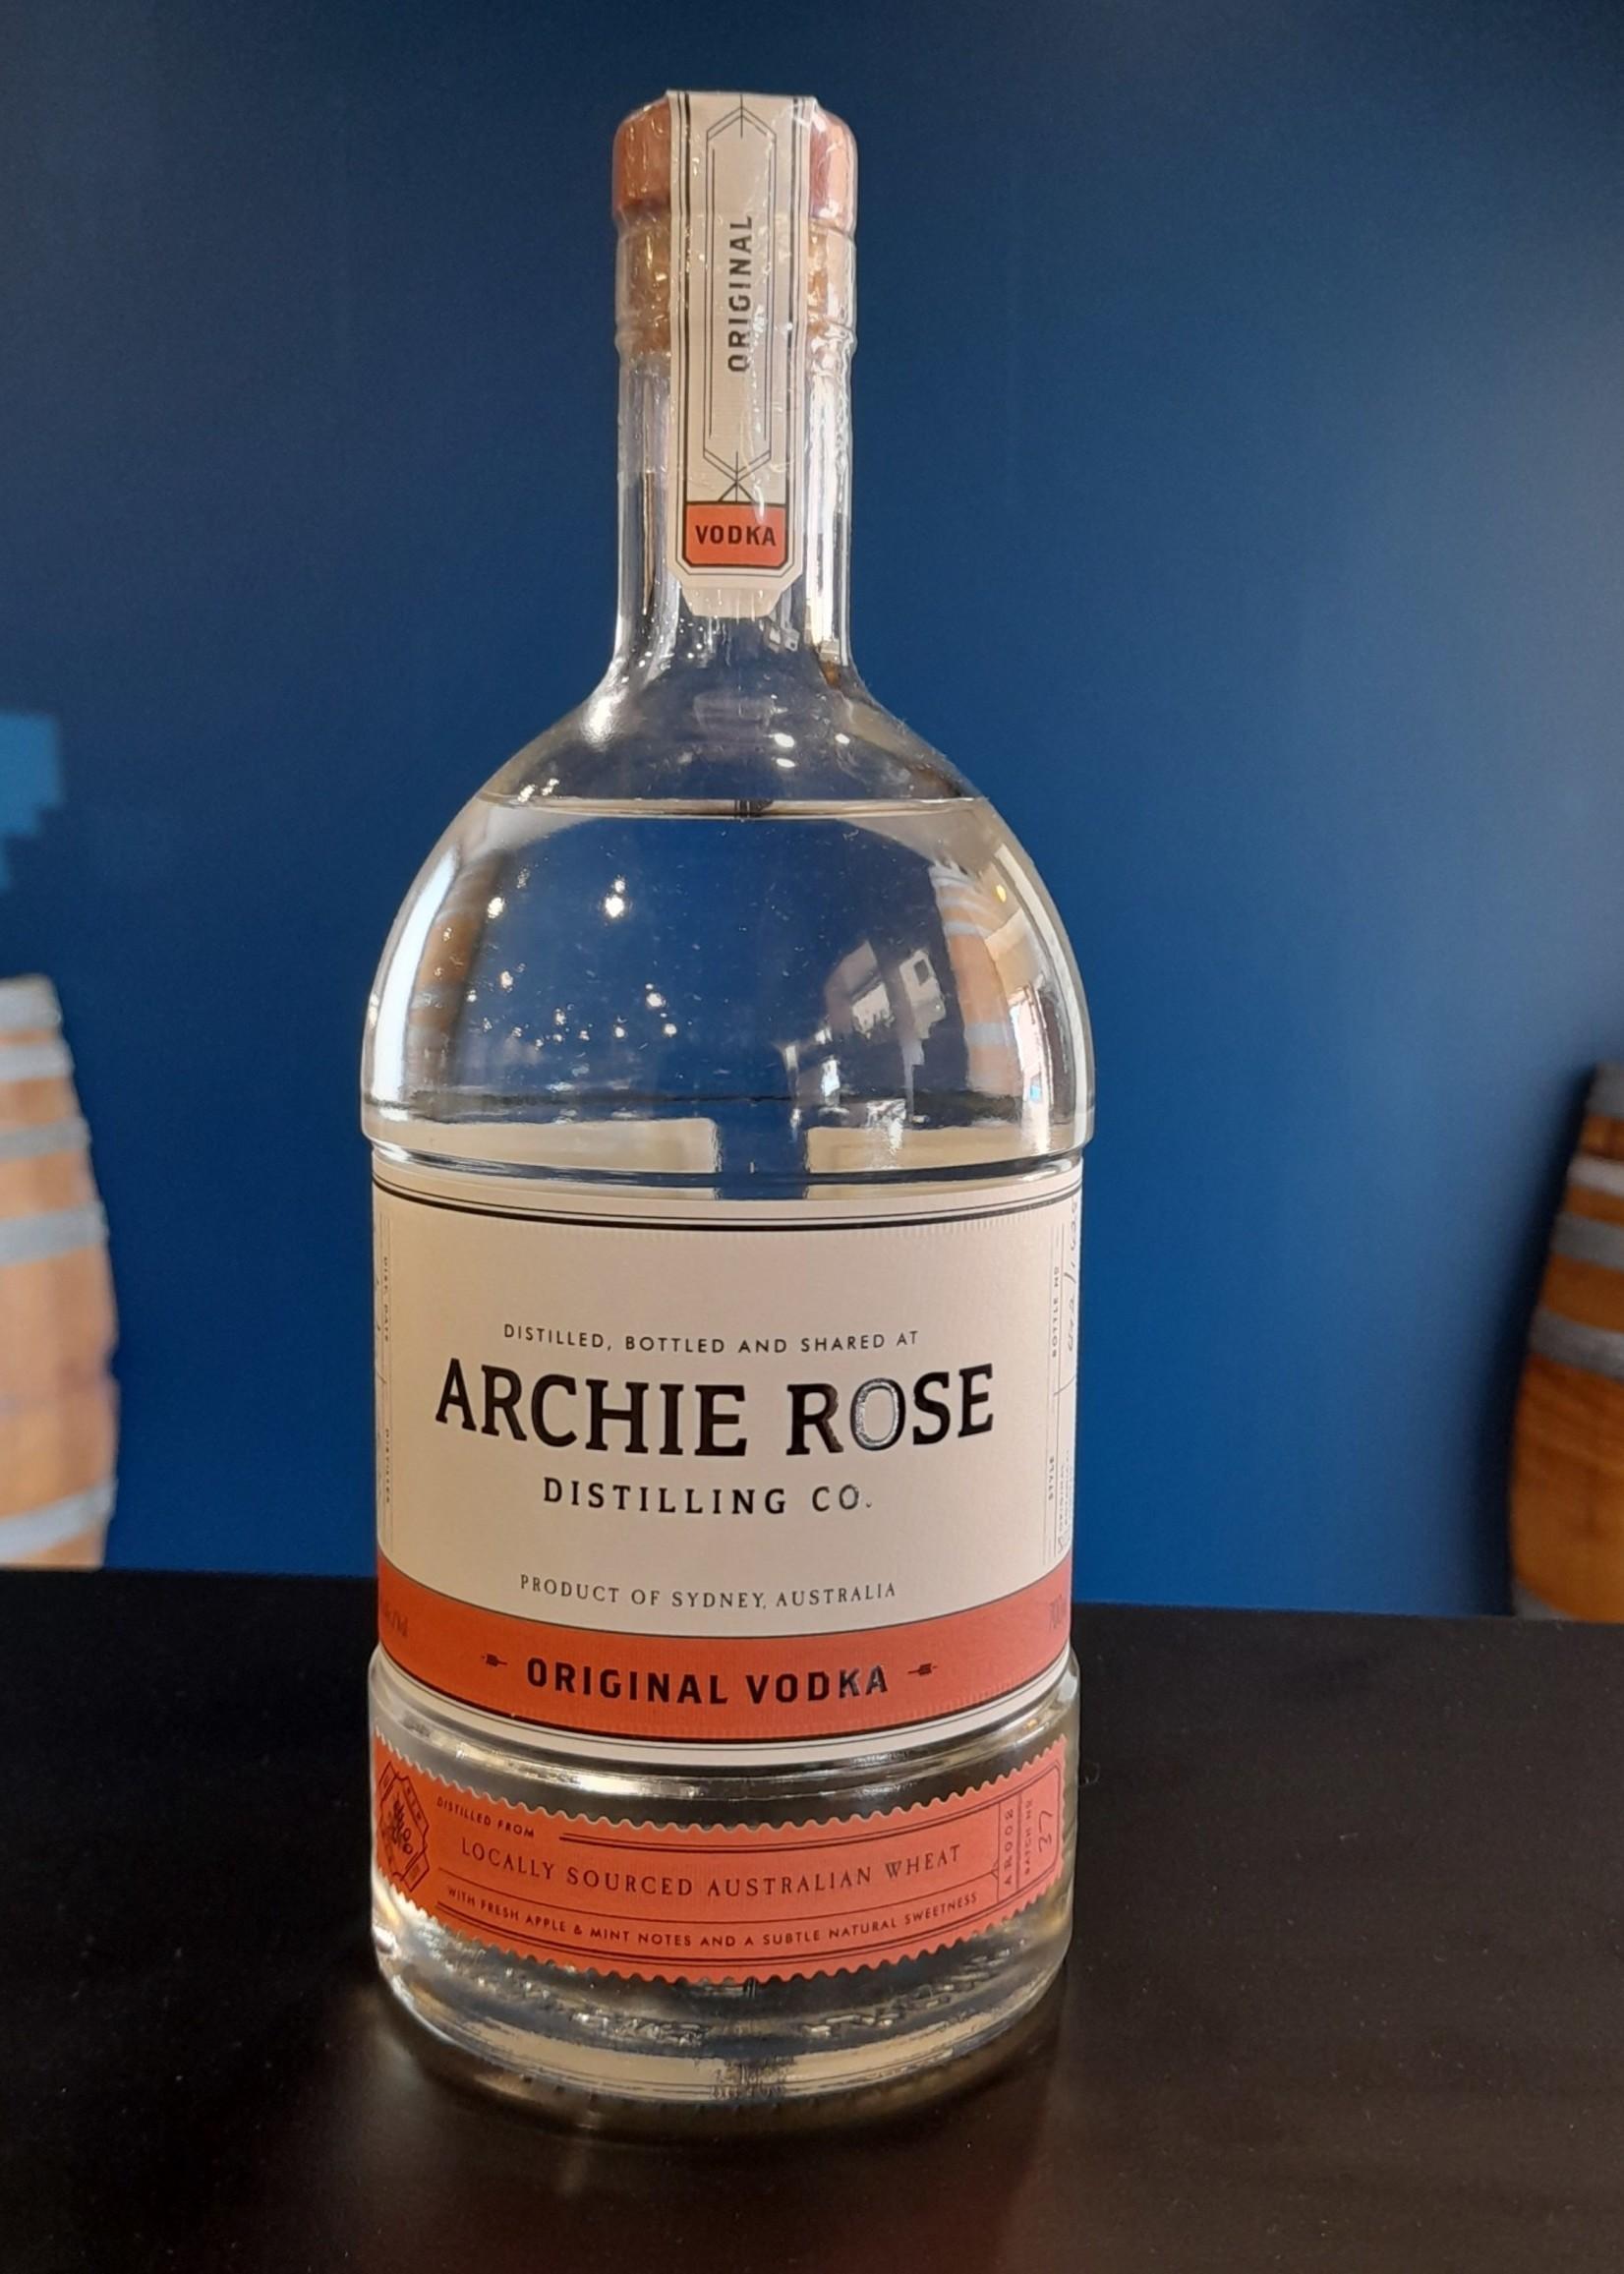 Archie Rose Archie Rose Original Vodka